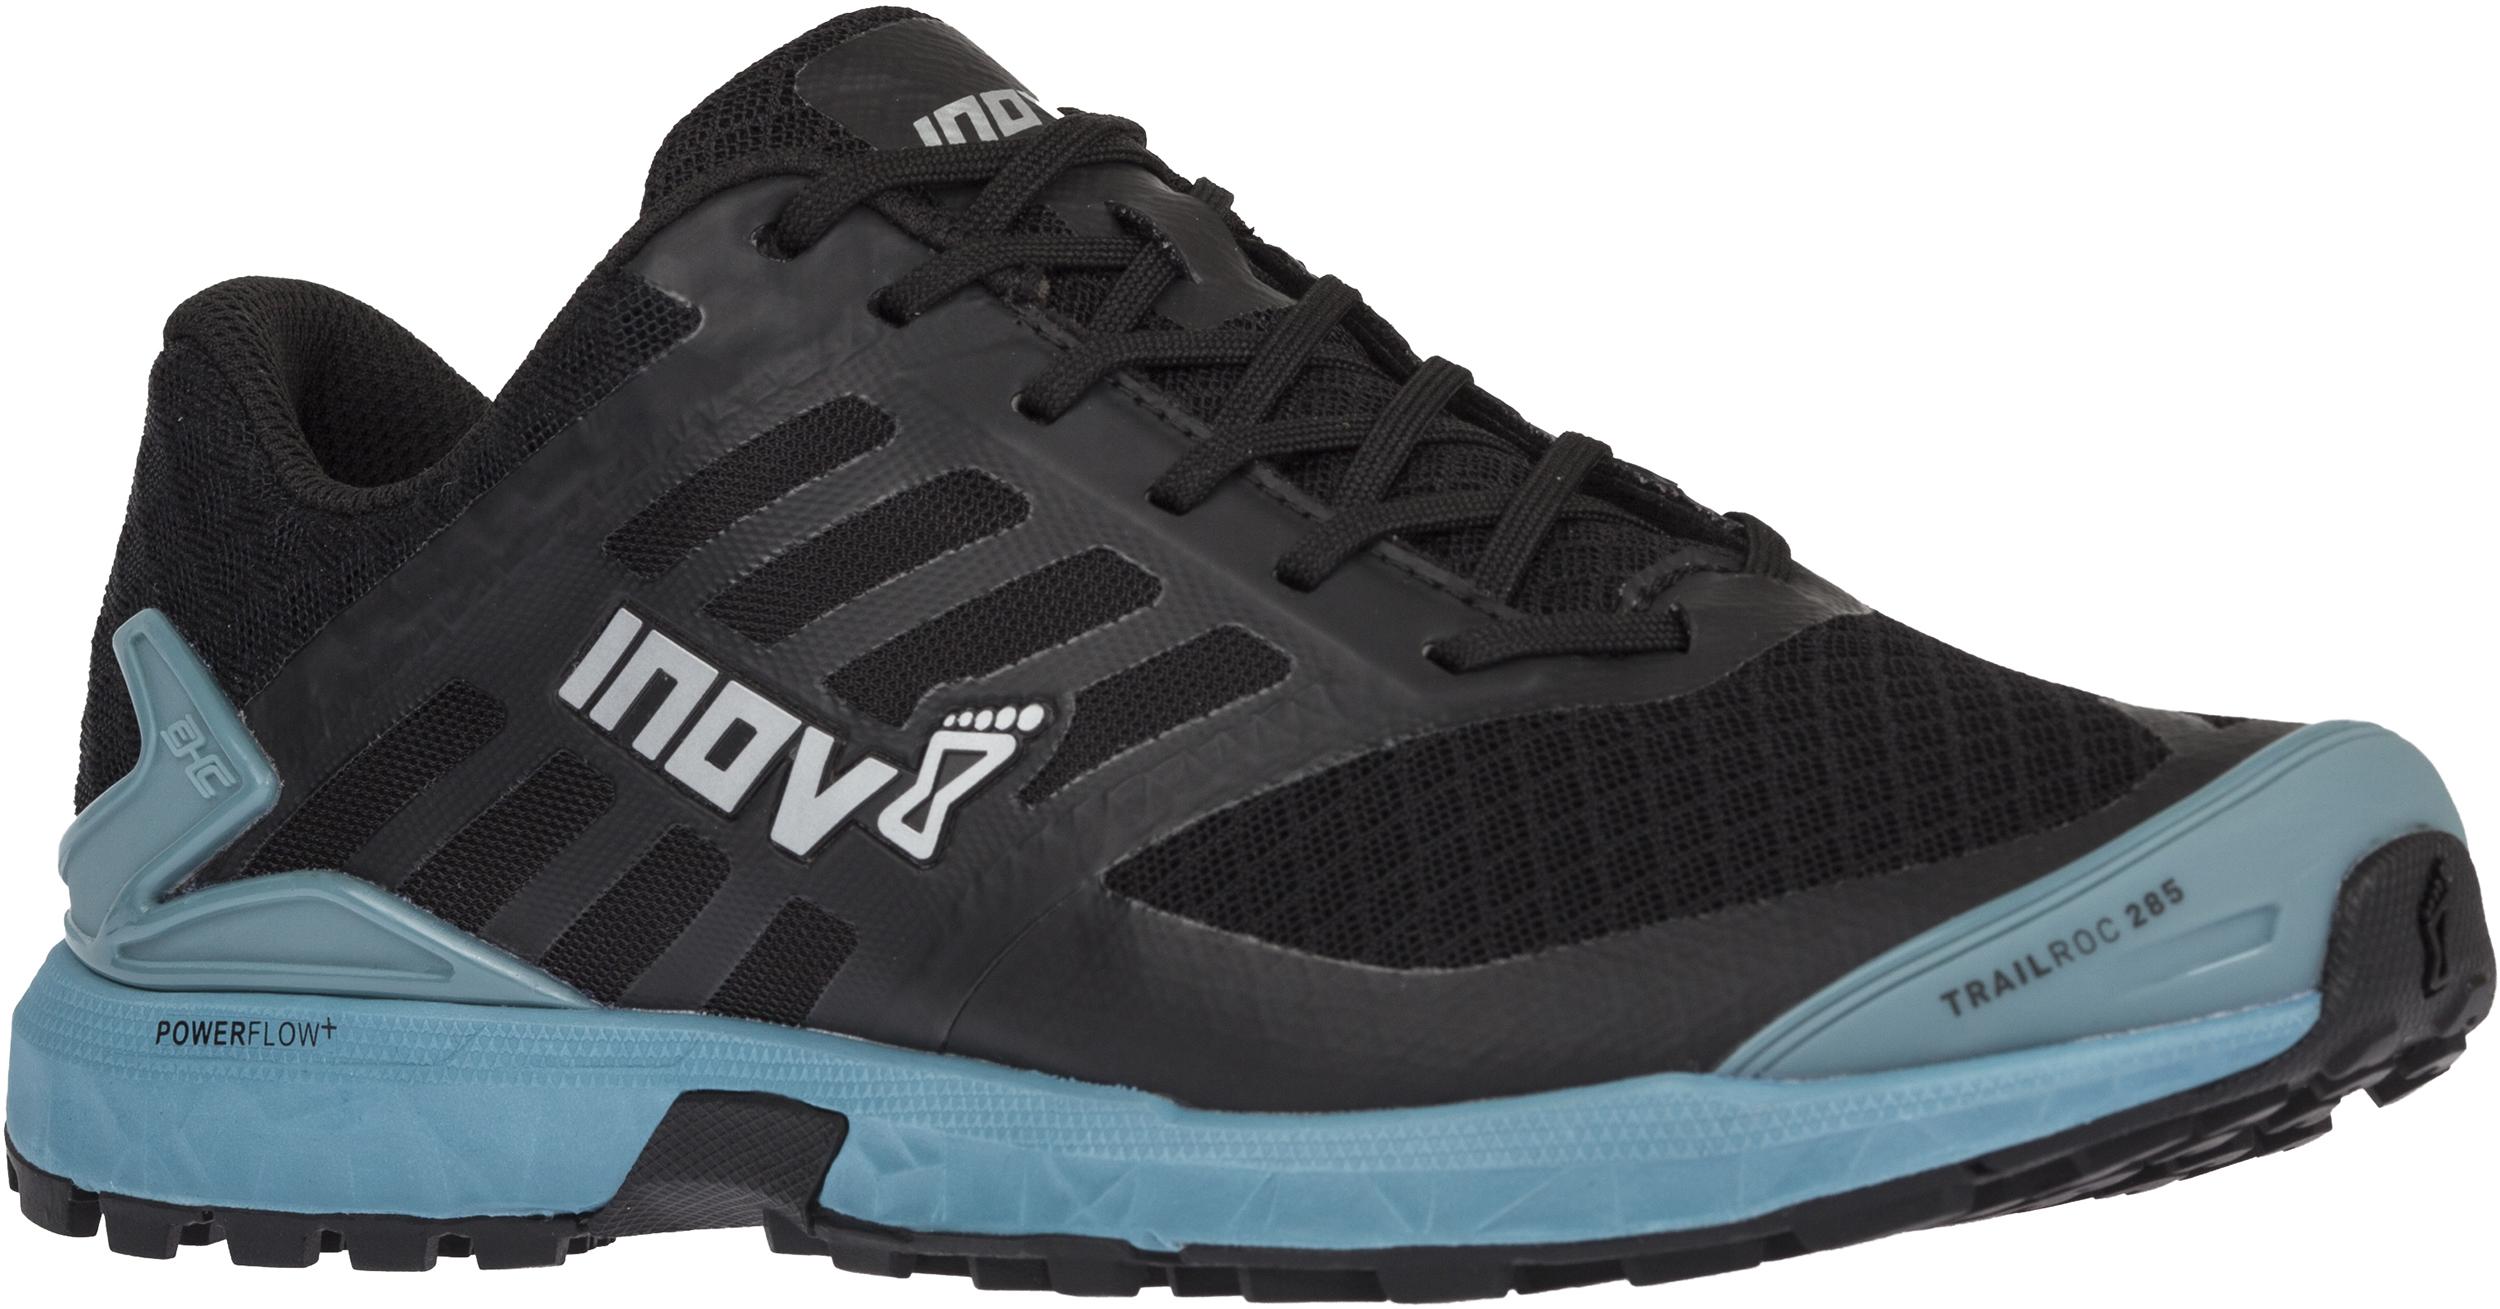 Inov-8 Trailroc 285 Trail Running Shoes - Women s 5b0825a37